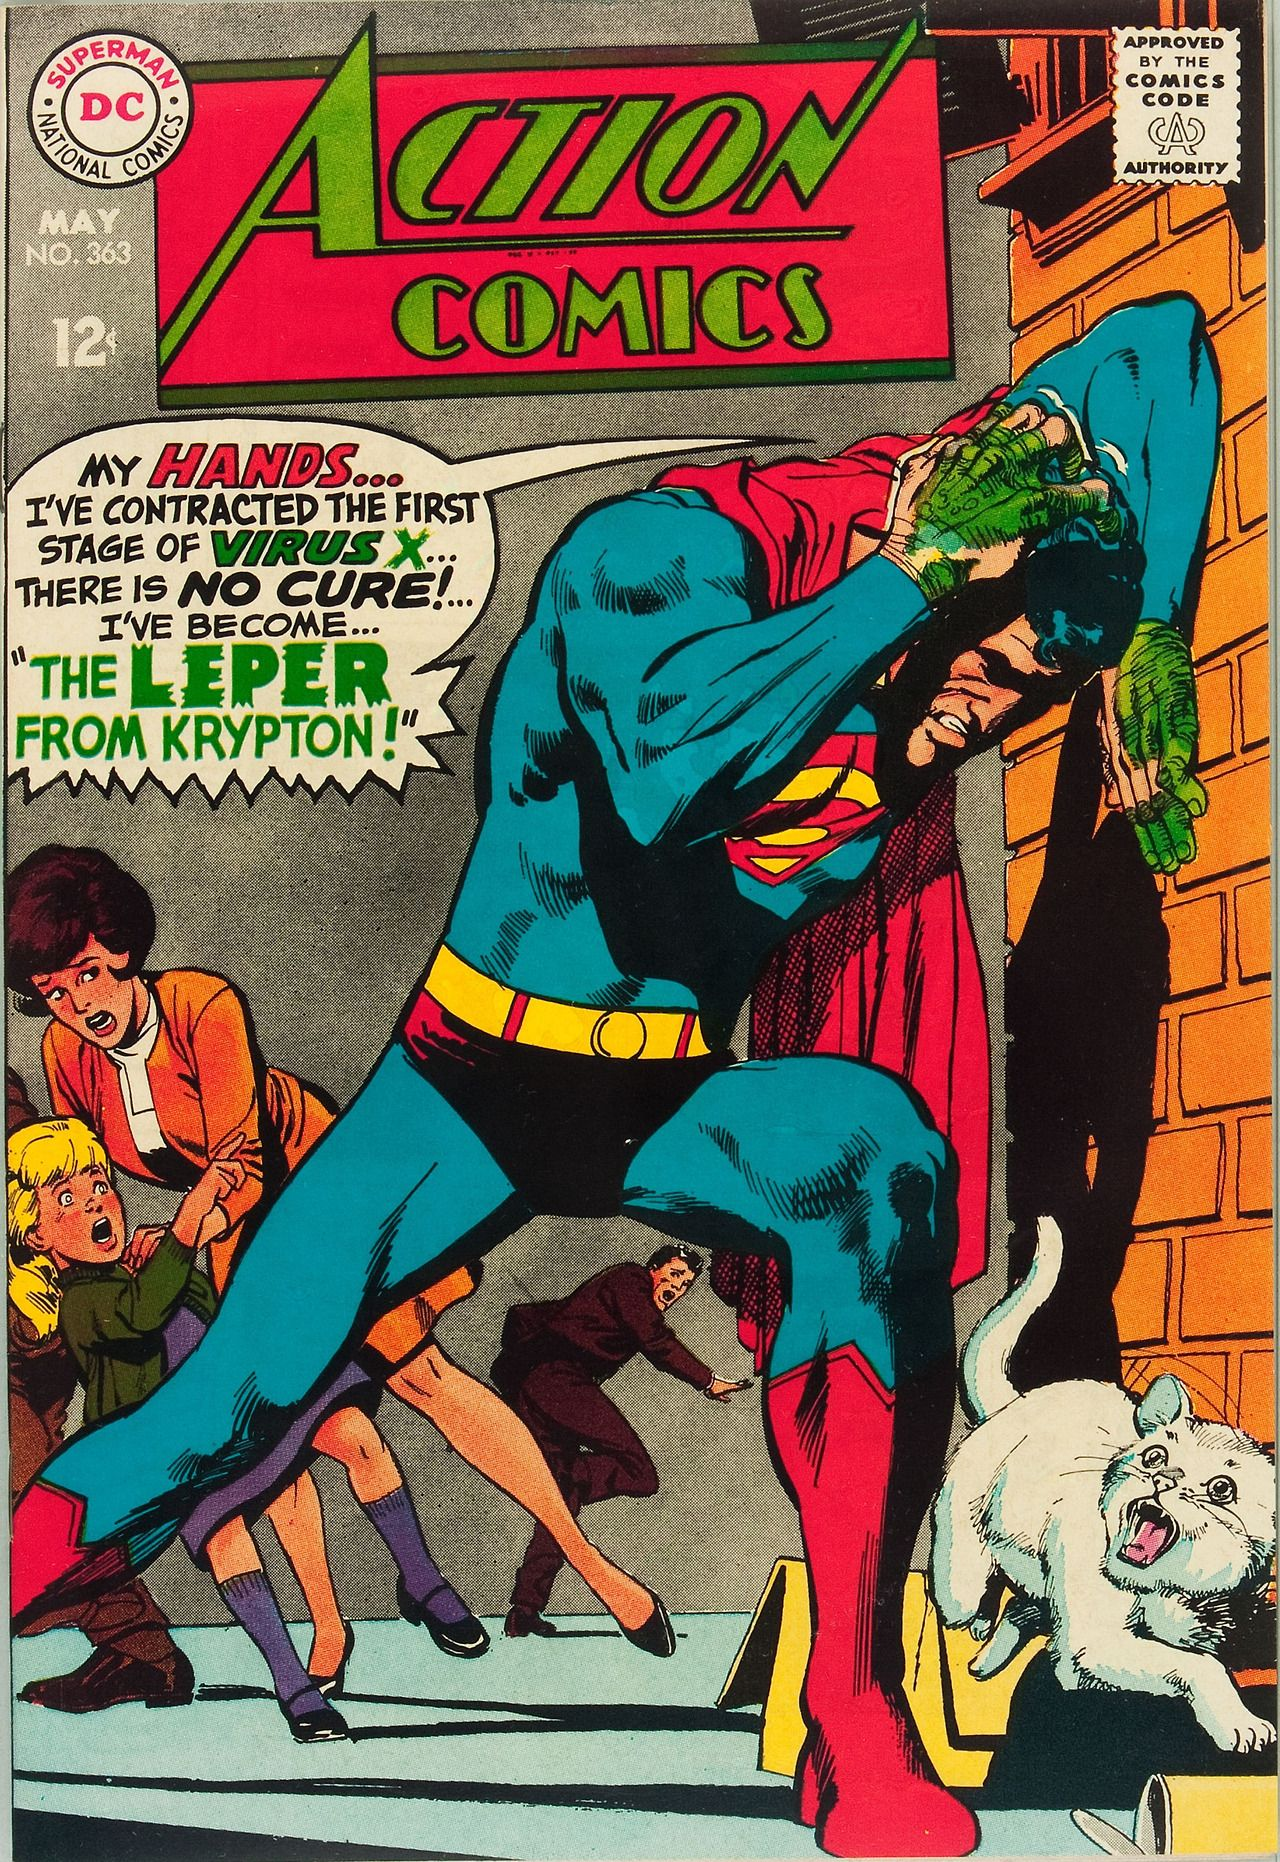 Action Comics 363. Art by Neal Adams.